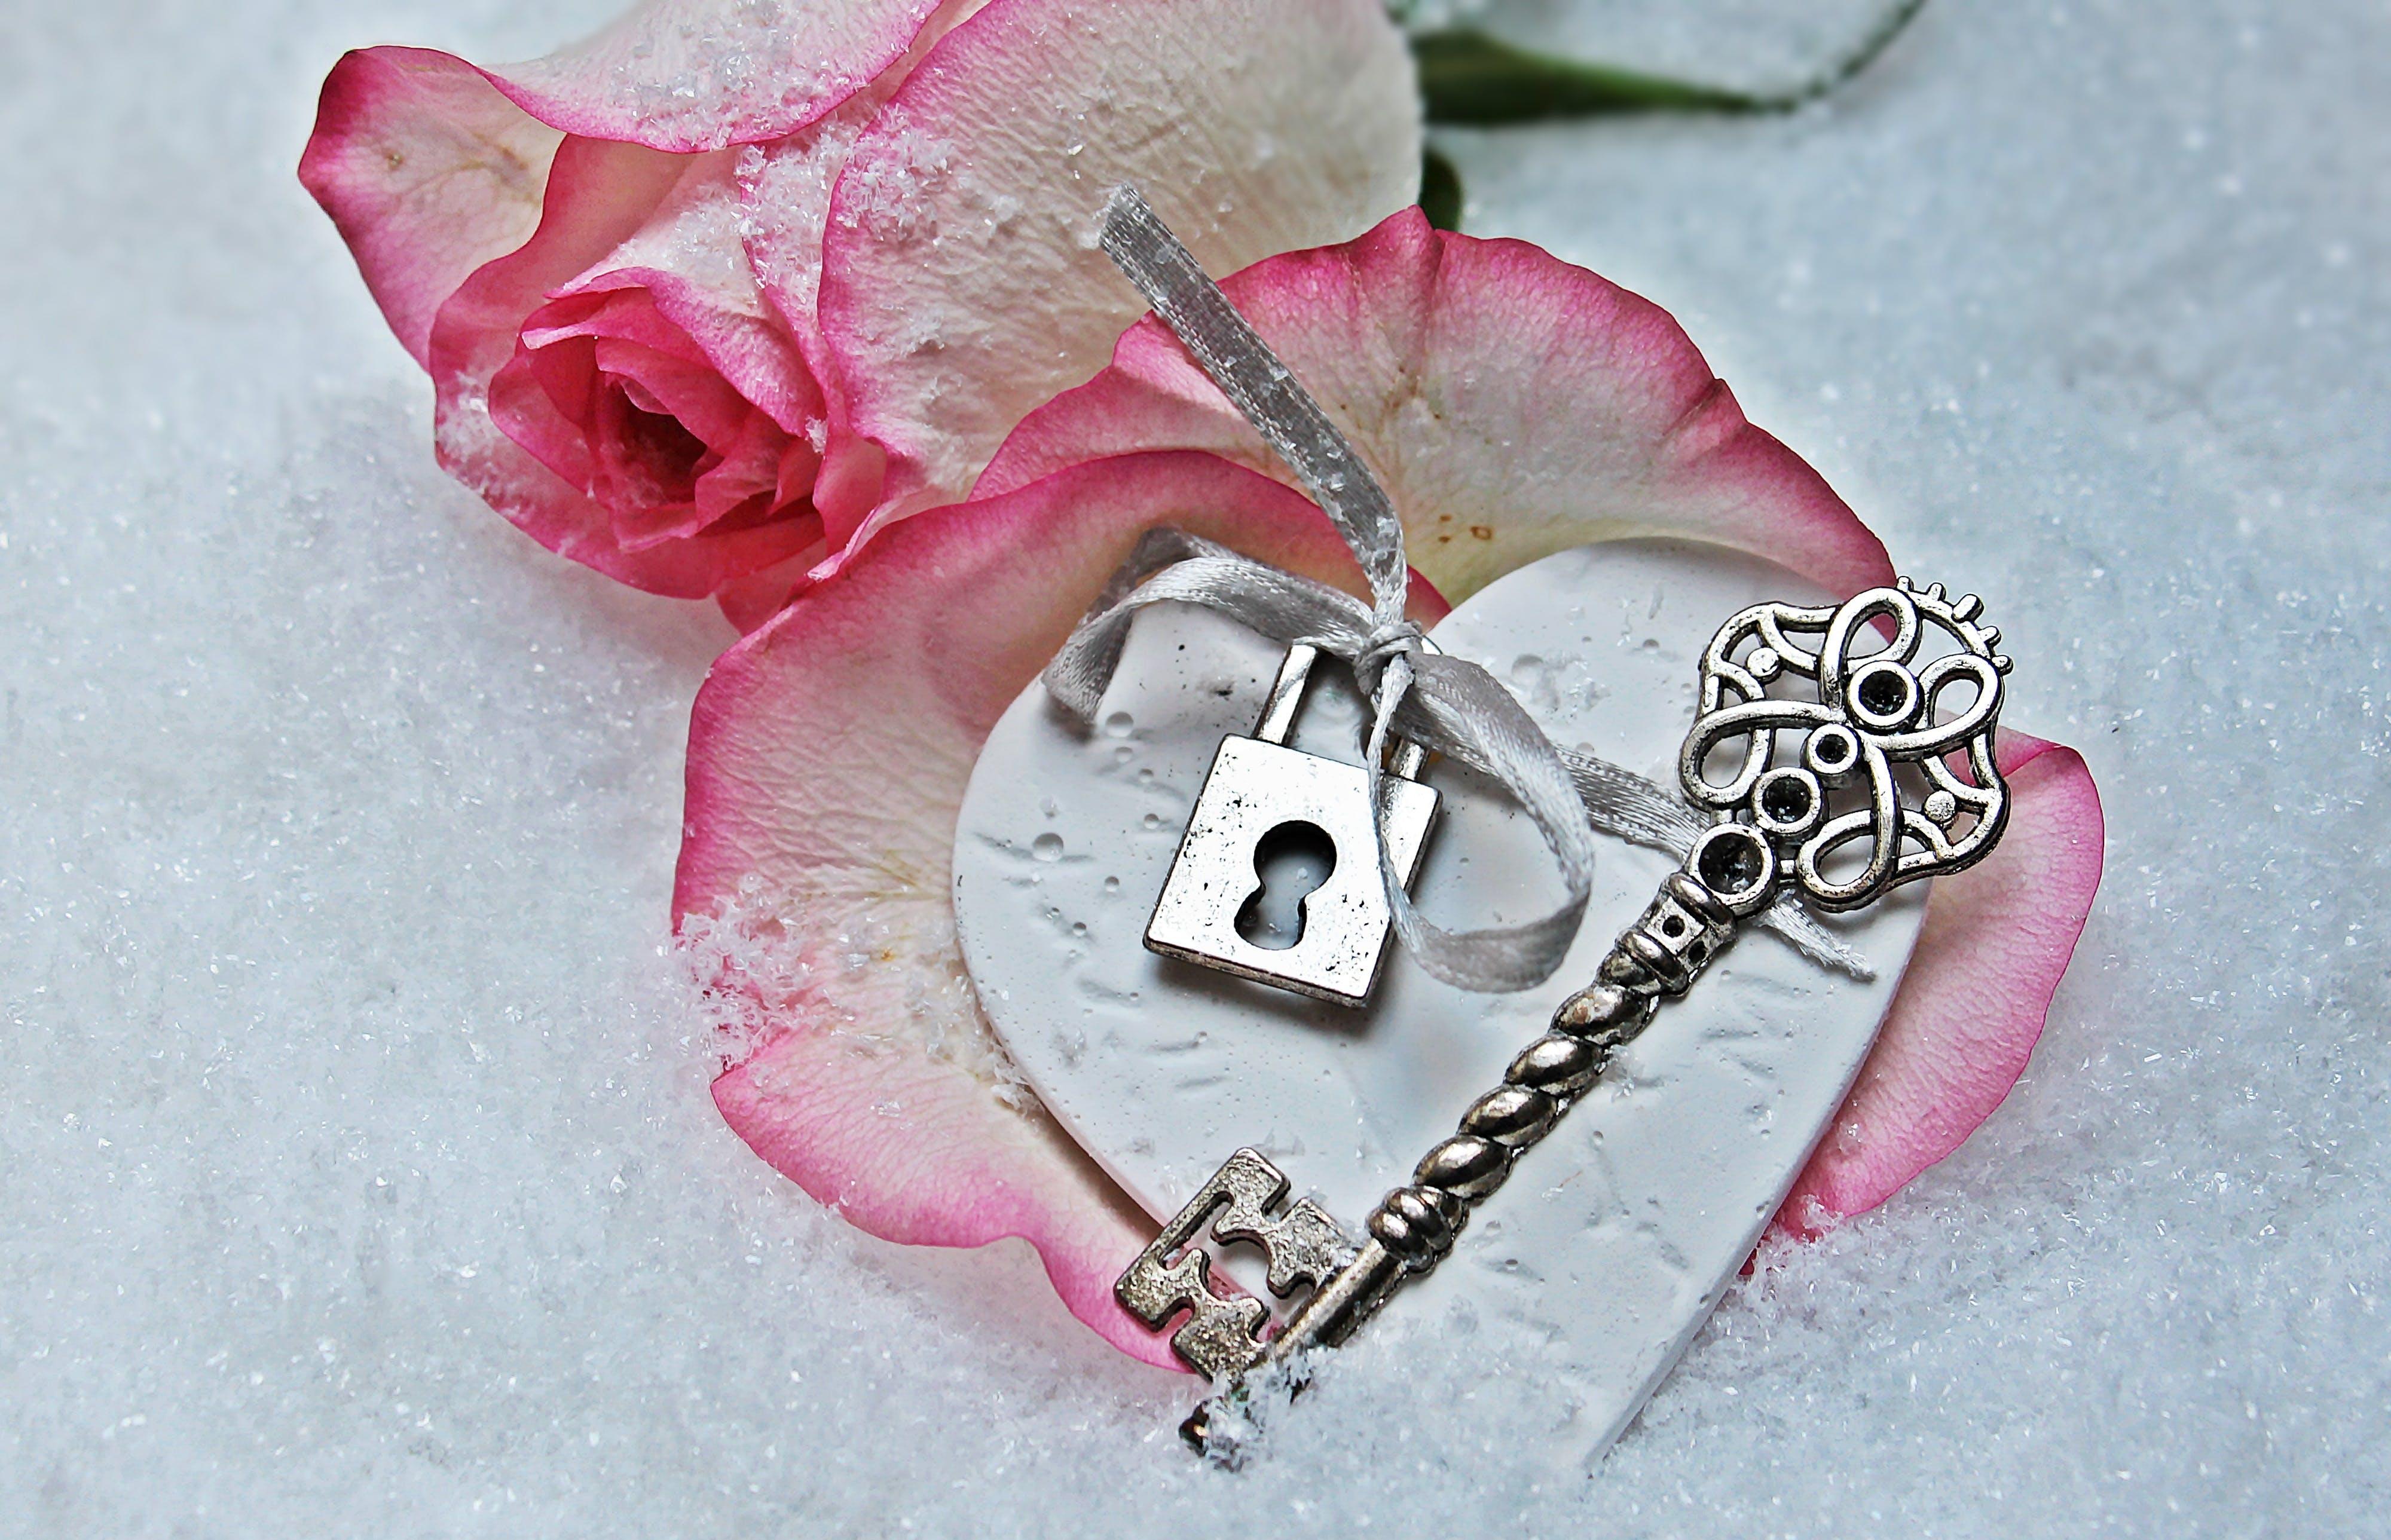 Free stock photo of love, heart, romantic, valentine's day